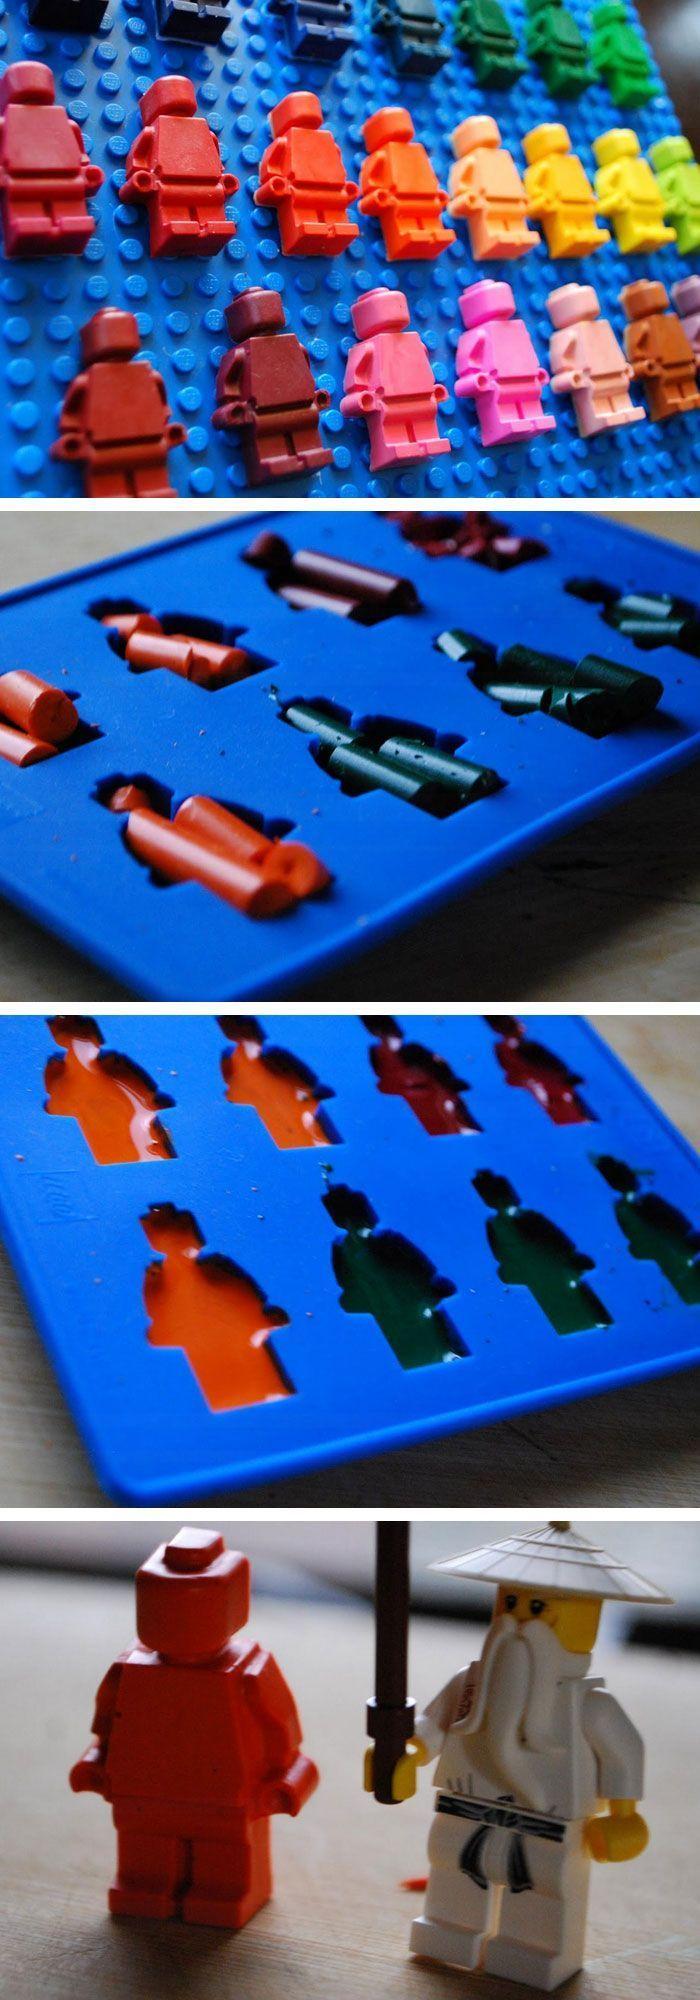 Lego Mini figure Crayons | Click Pic for 22 DIY Christmas Gifts for Kids to Make | Handmade Christmas Gifts for Boys